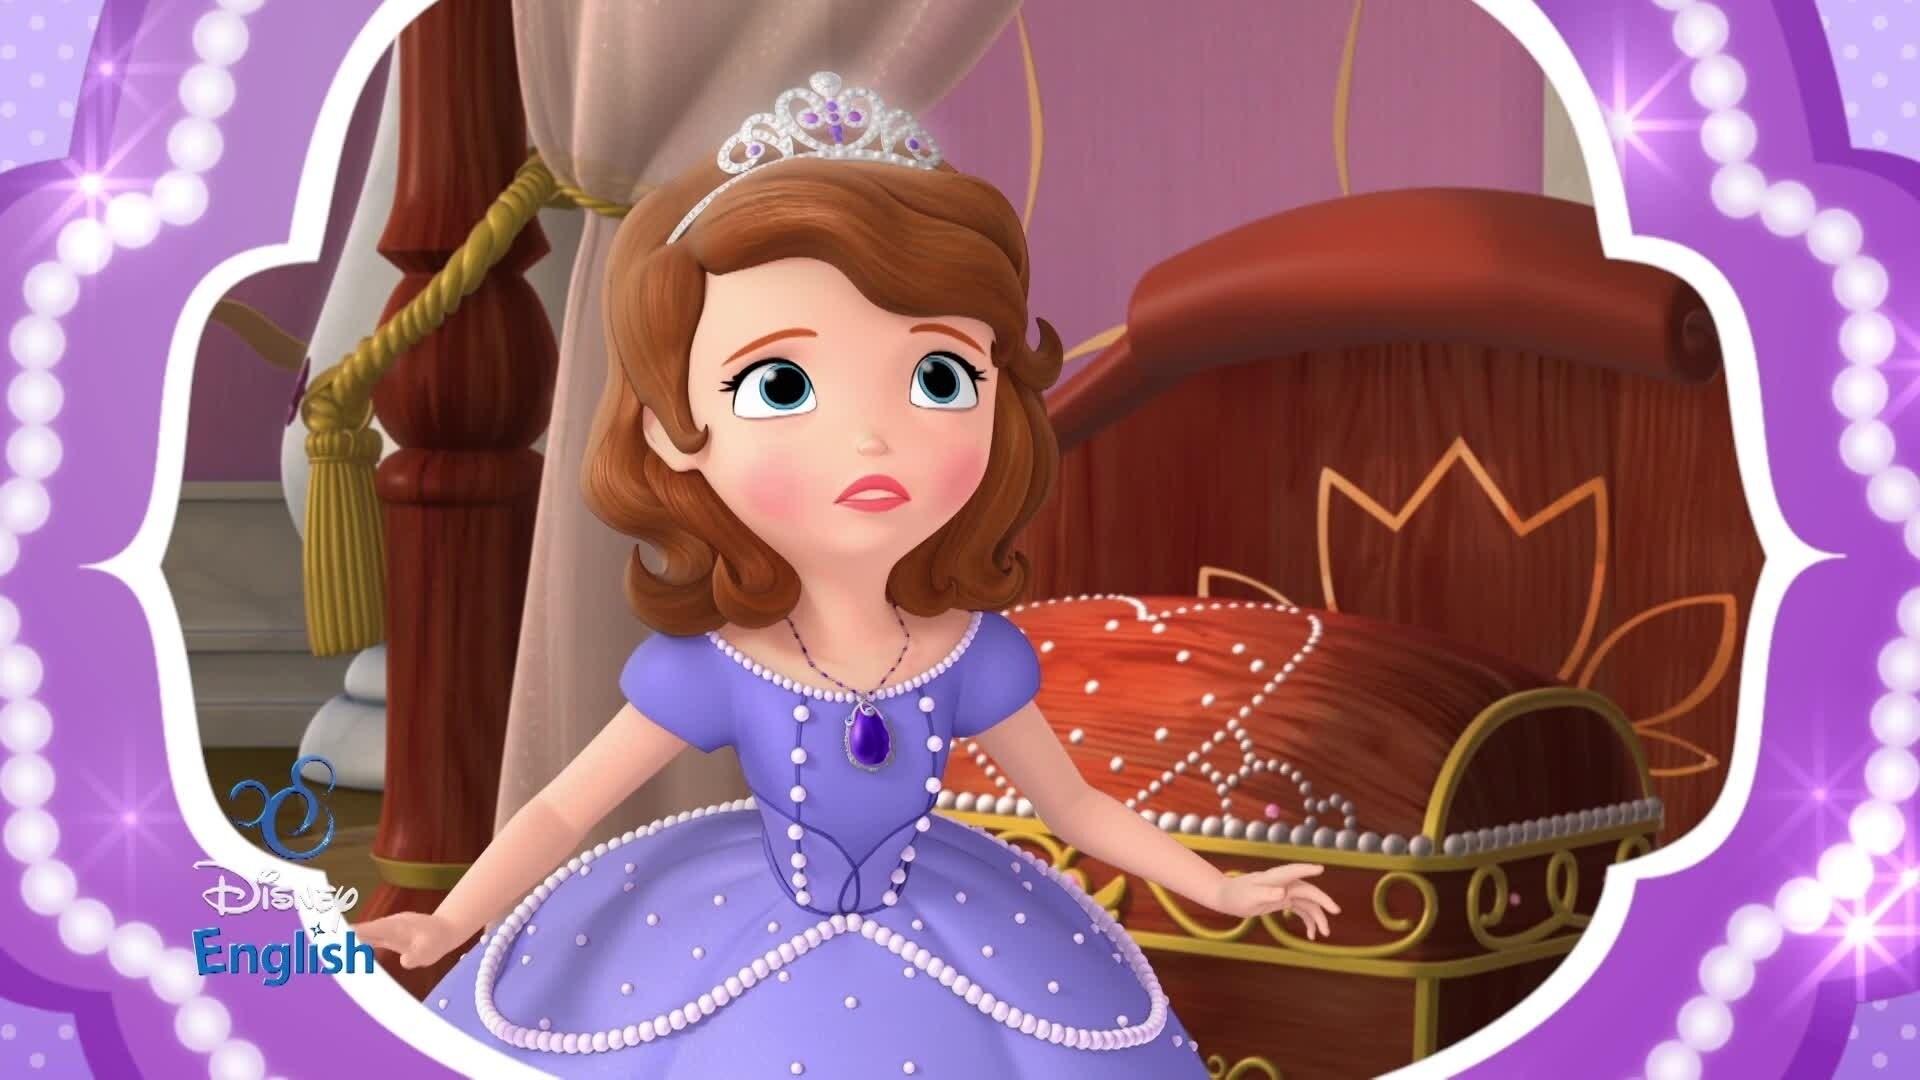 Disney English - Good and bad